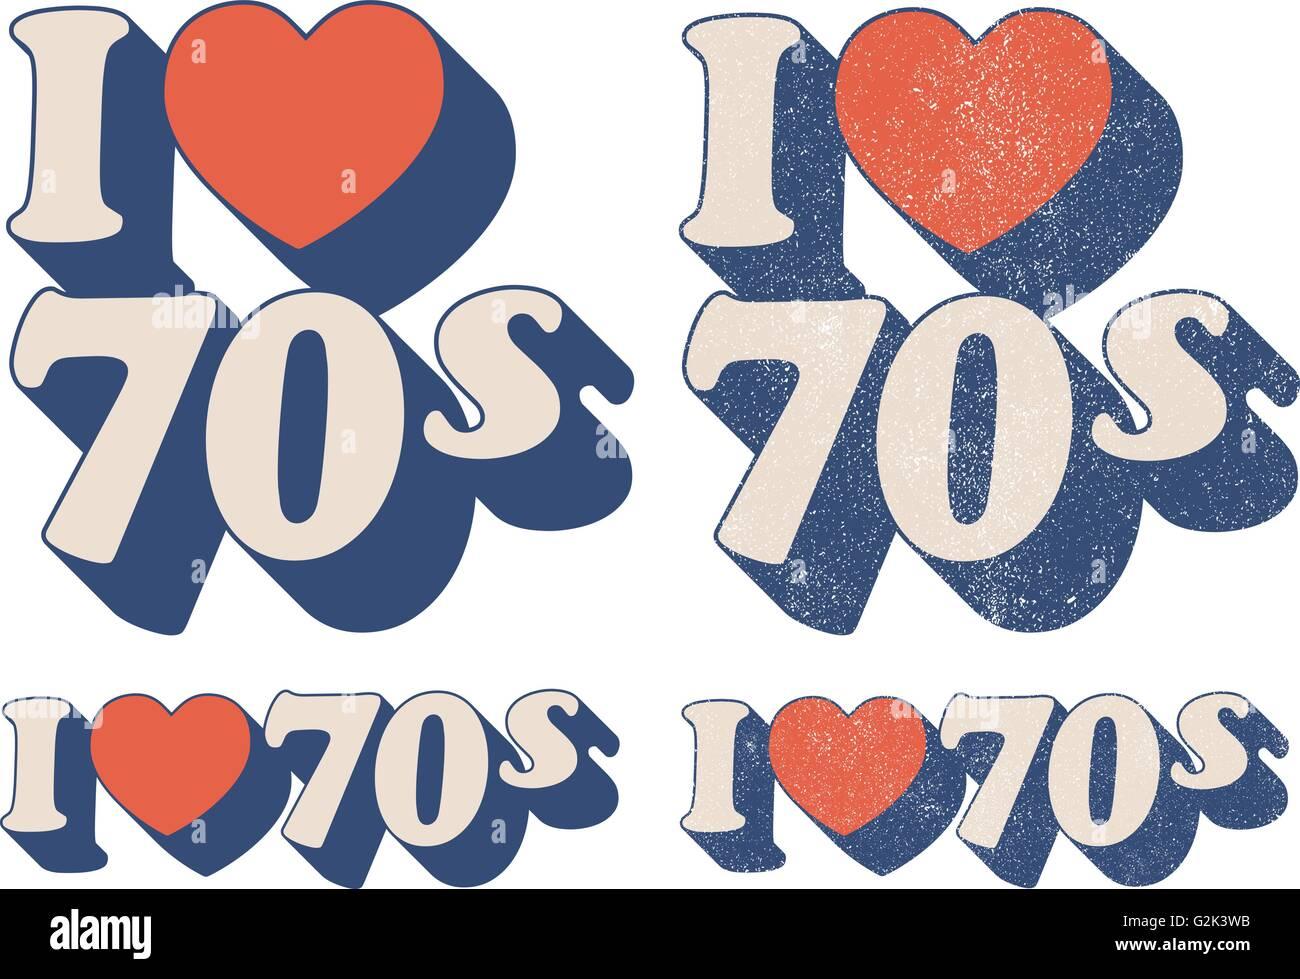 I Love 70s - Stock Image